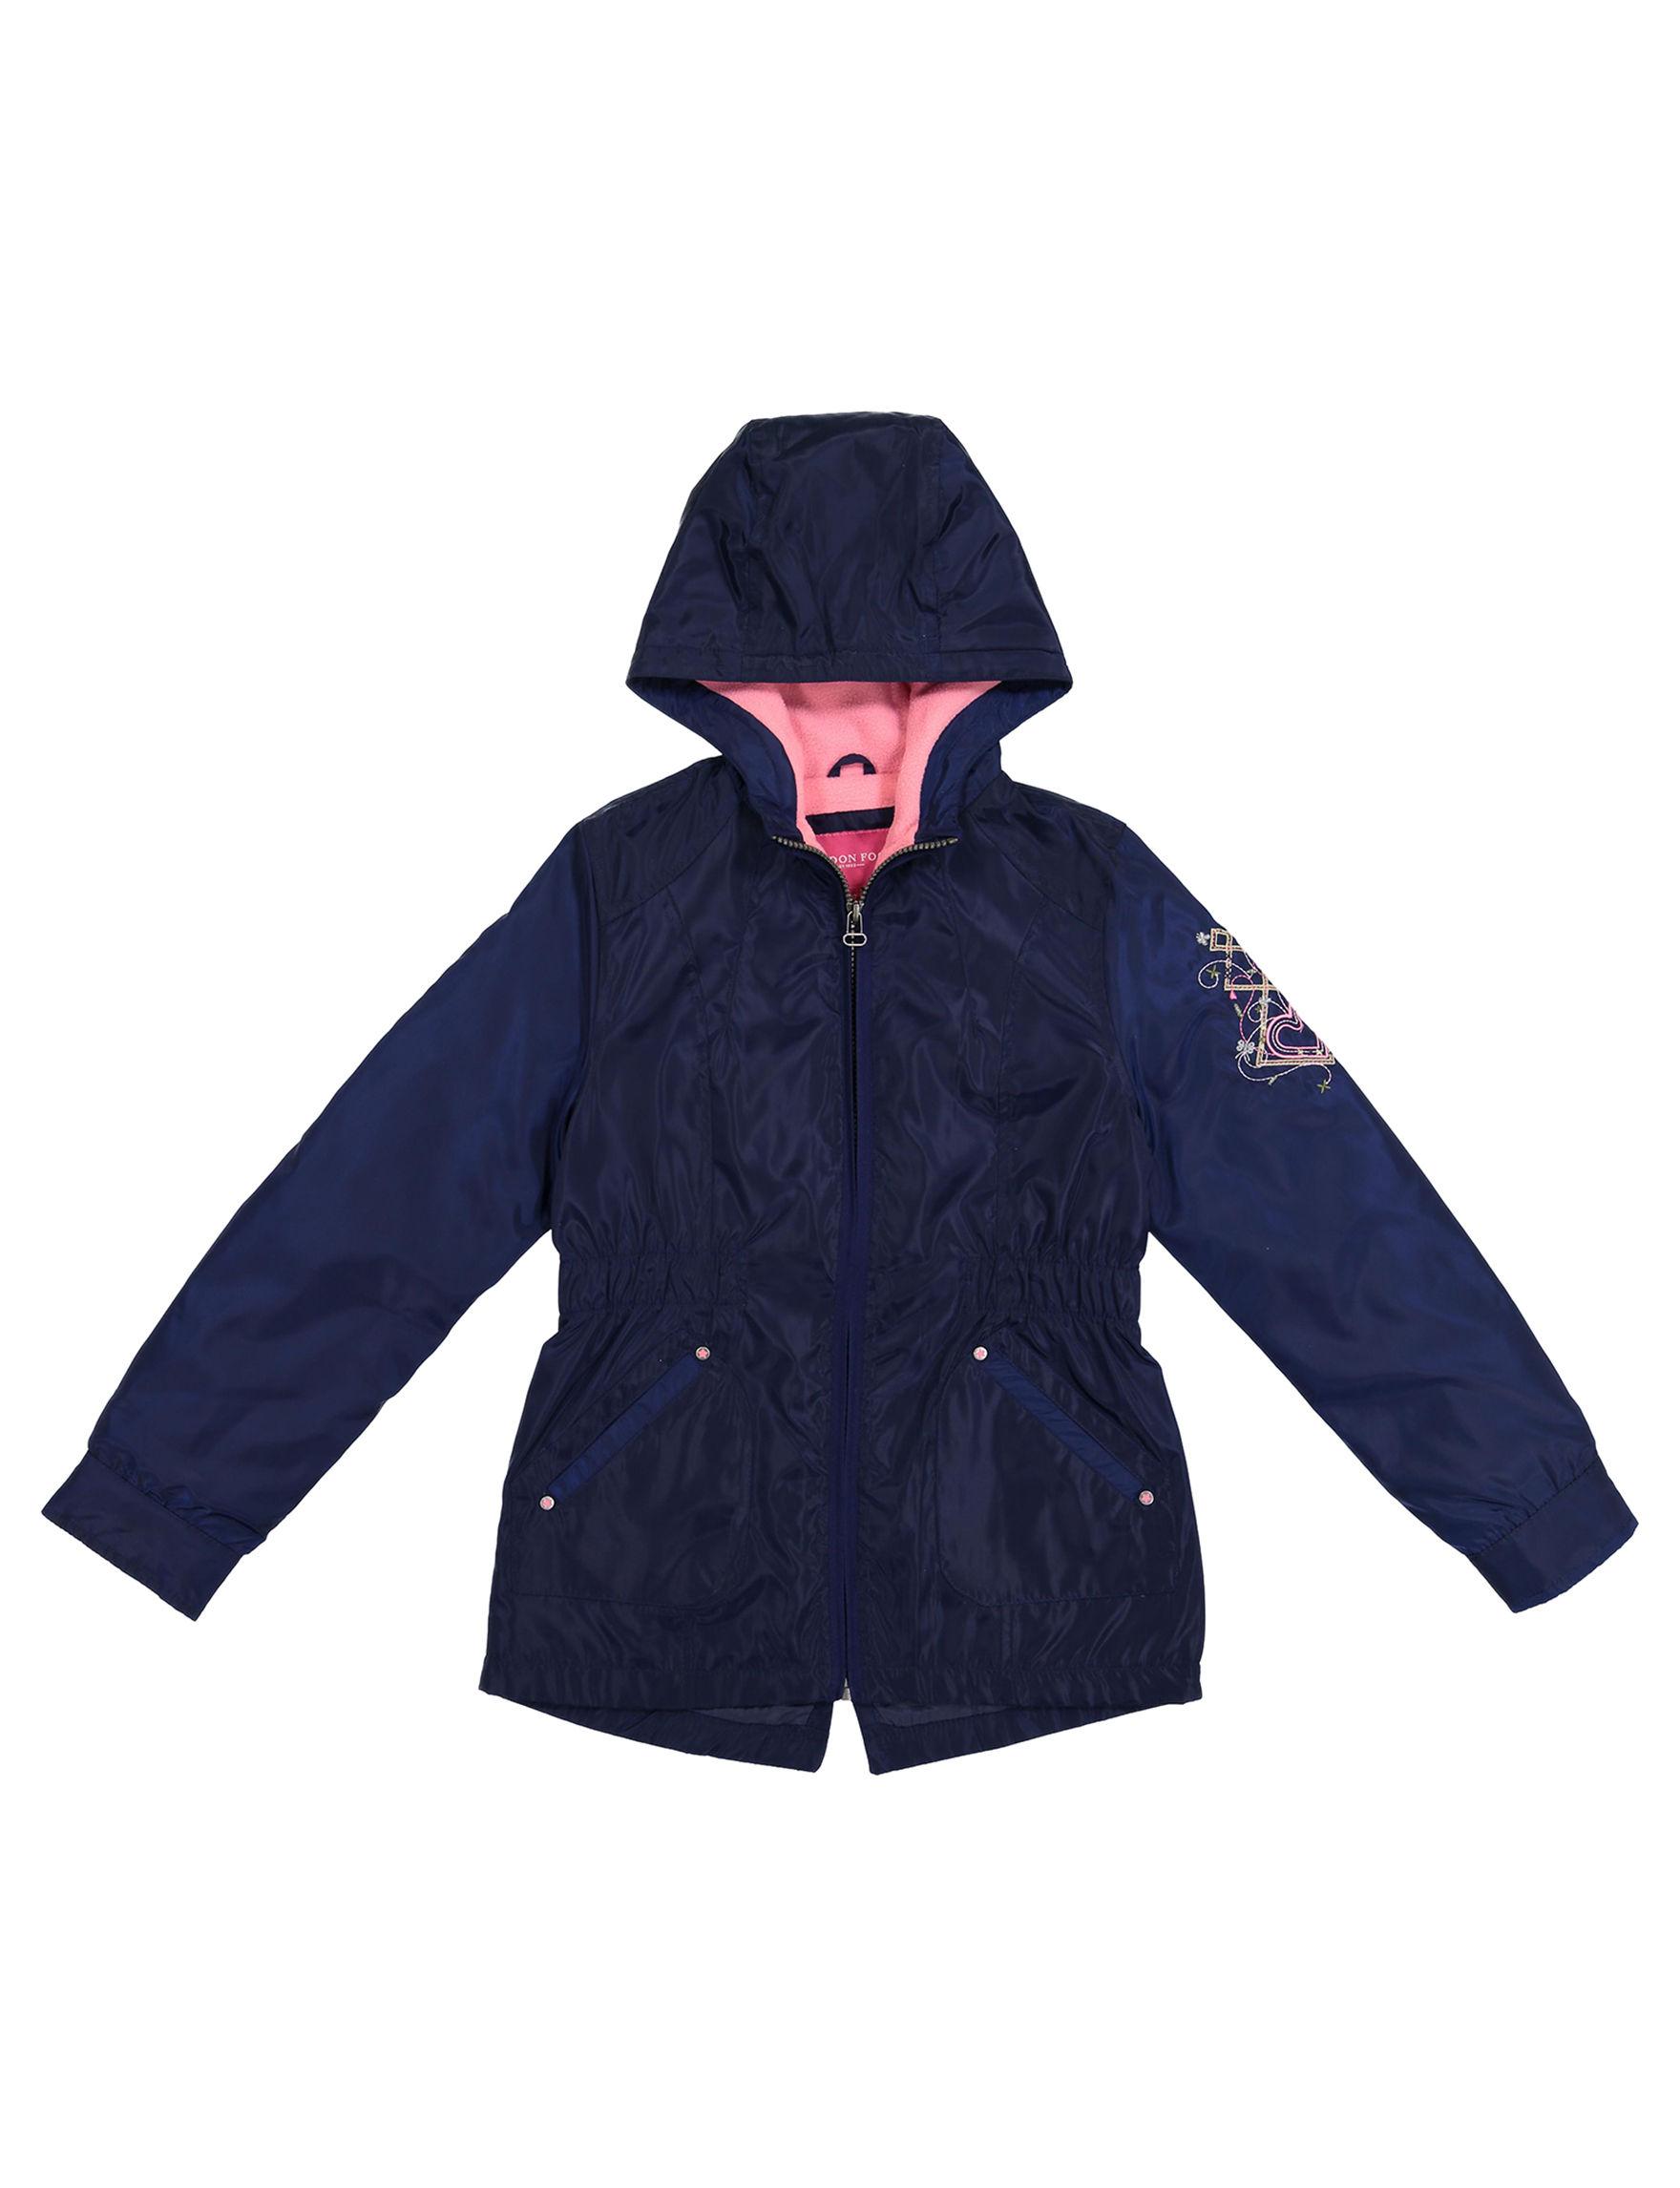 London Fog Navy Fleece & Soft Shell Jackets